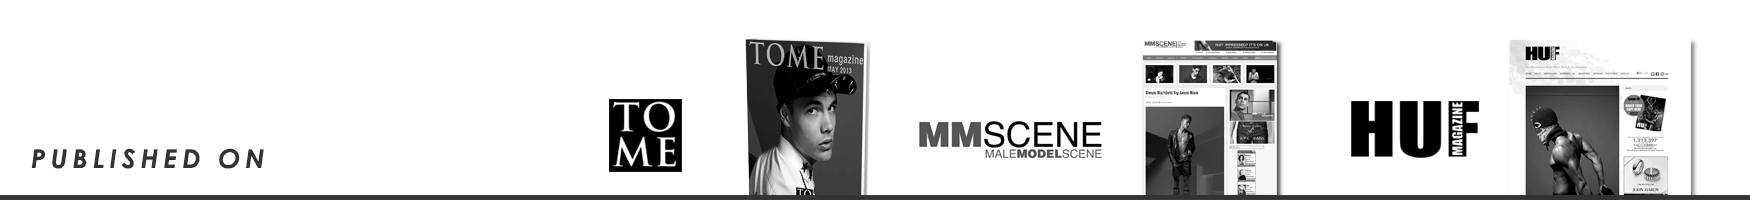 MagazineHeadline-Dean